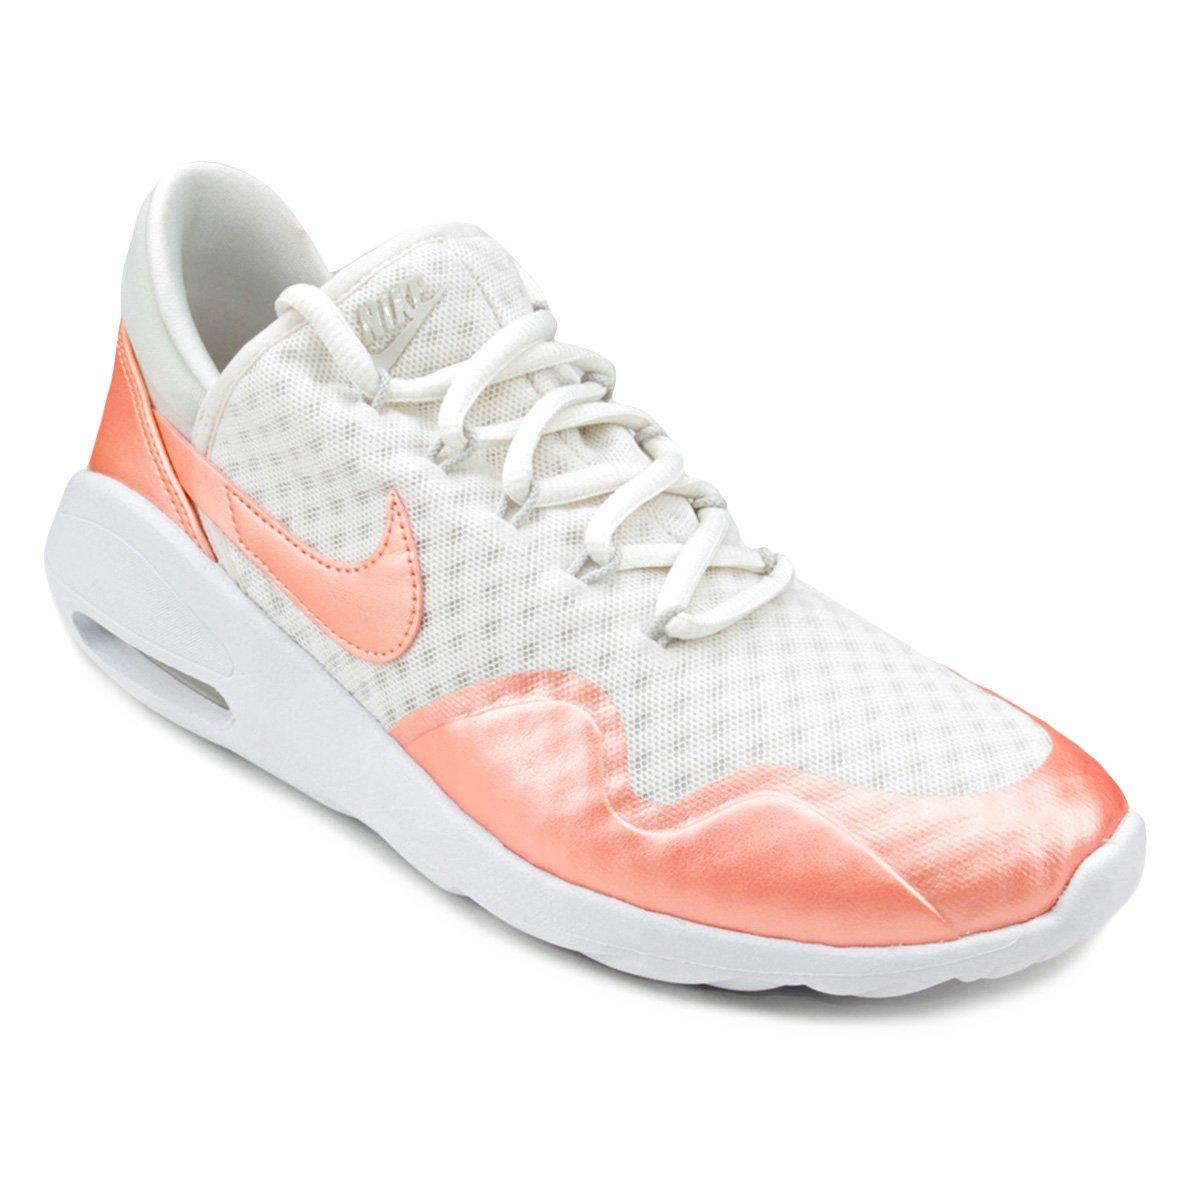 885612c62a4d4 Tênis Nike Air Max Sasha Feminino - Off White - Compre Agora